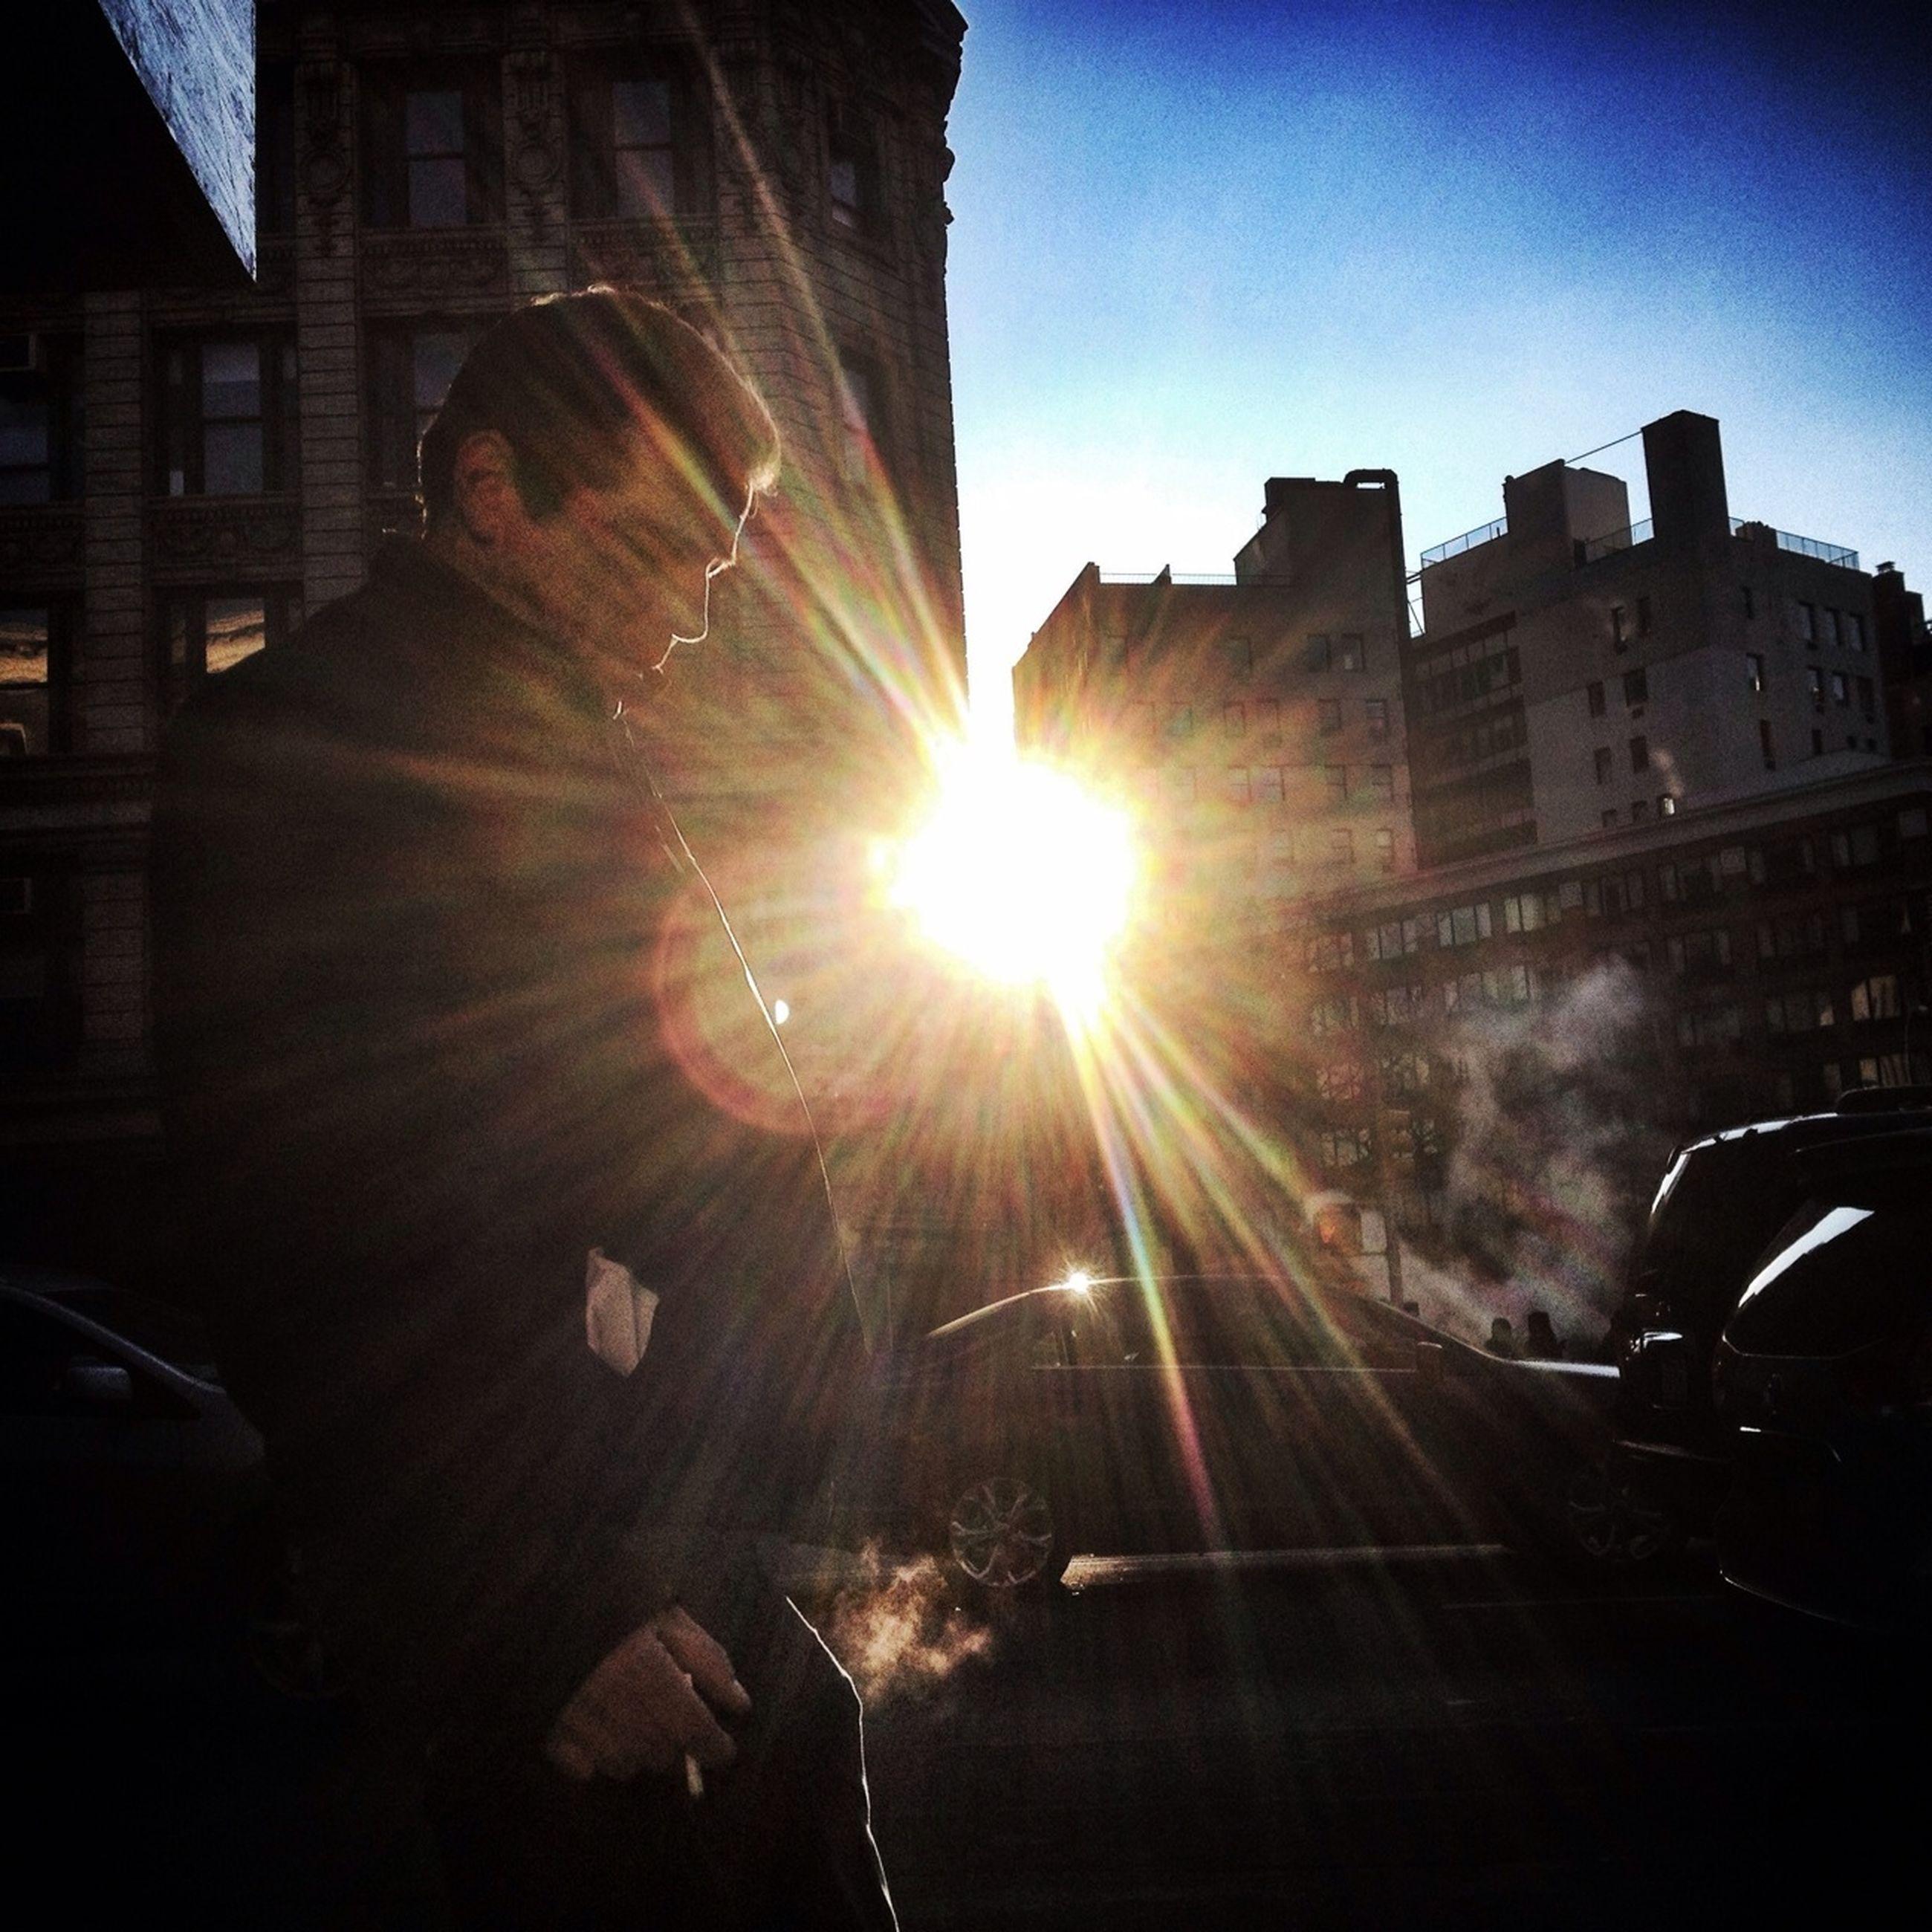 transportation, building exterior, architecture, built structure, land vehicle, mode of transport, car, city, sun, street, sunbeam, sunlight, lens flare, road, building, city street, sky, city life, travel, on the move